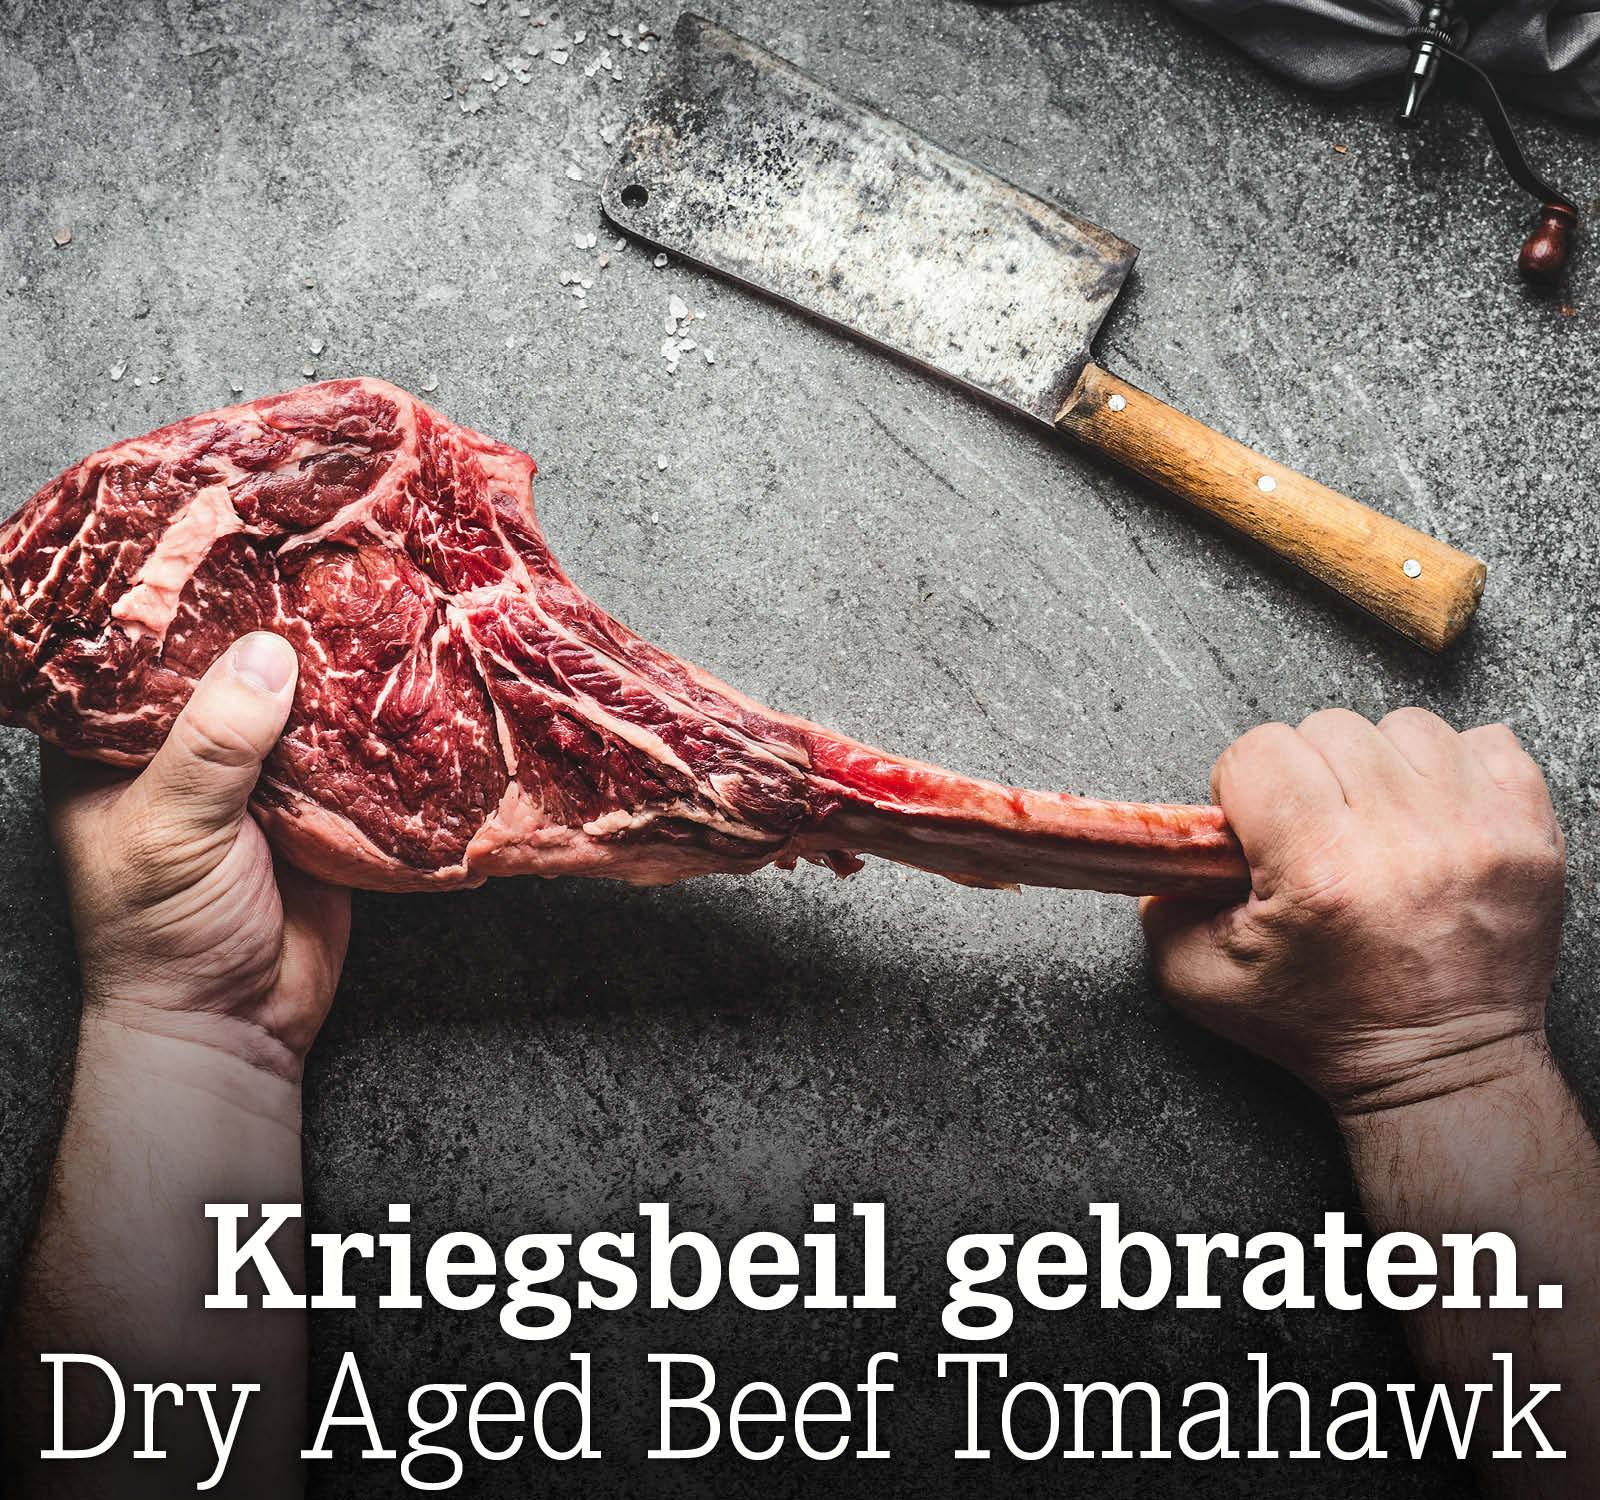 Kriegsbeil gebraten. Dry Aged Beef Tomahawk